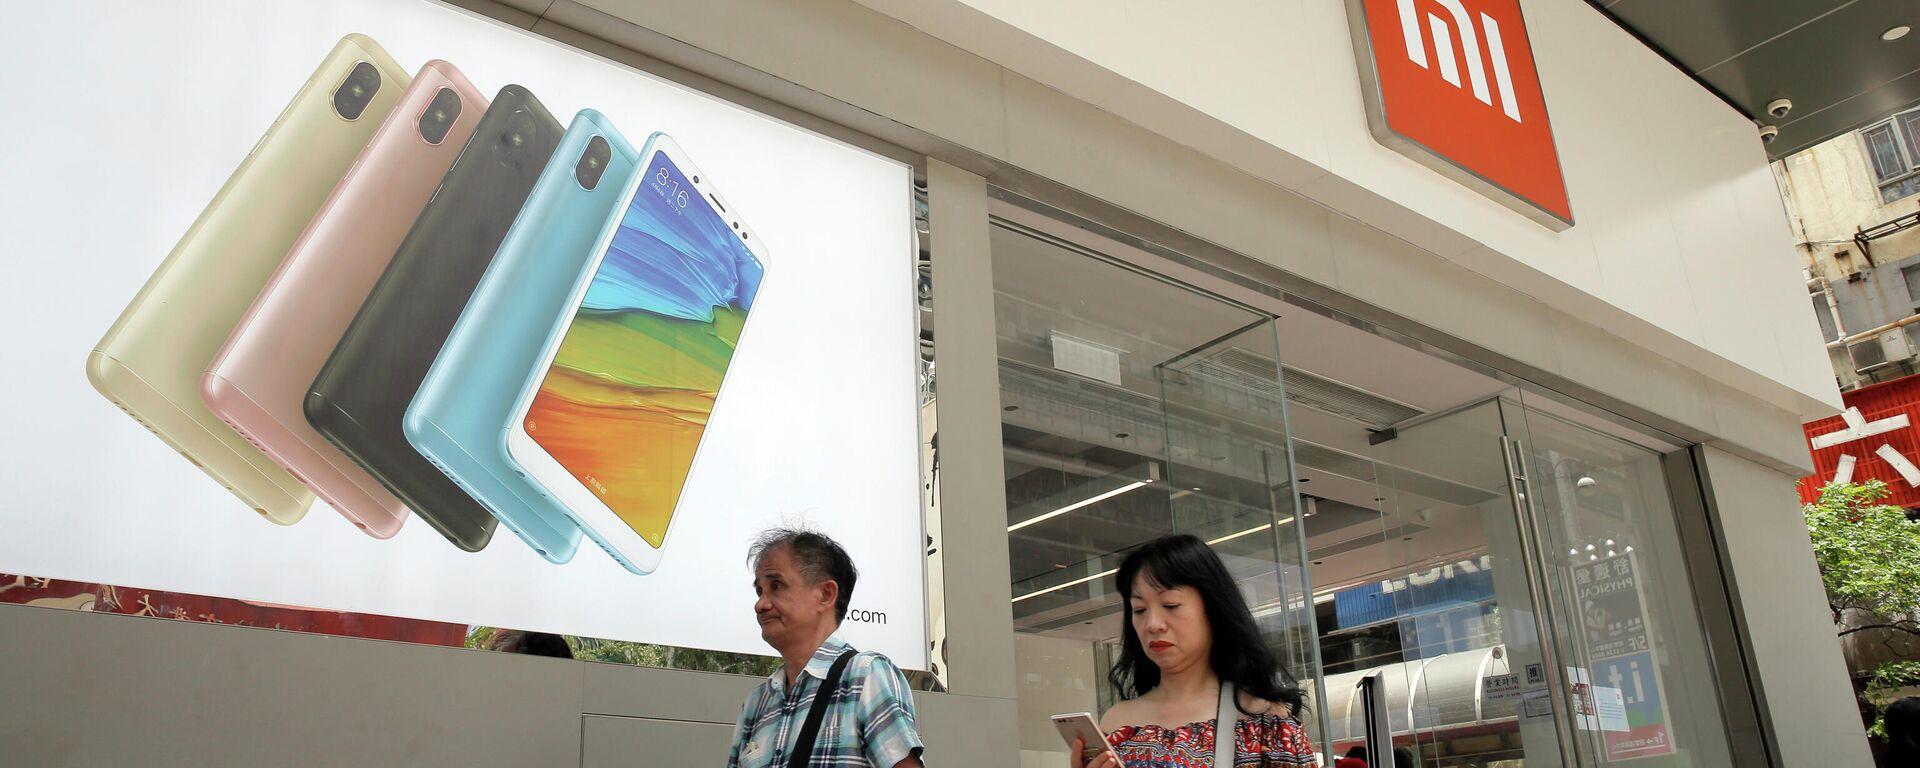 Xiaomi (Symbolbild) - SNA, 1920, 04.02.2021